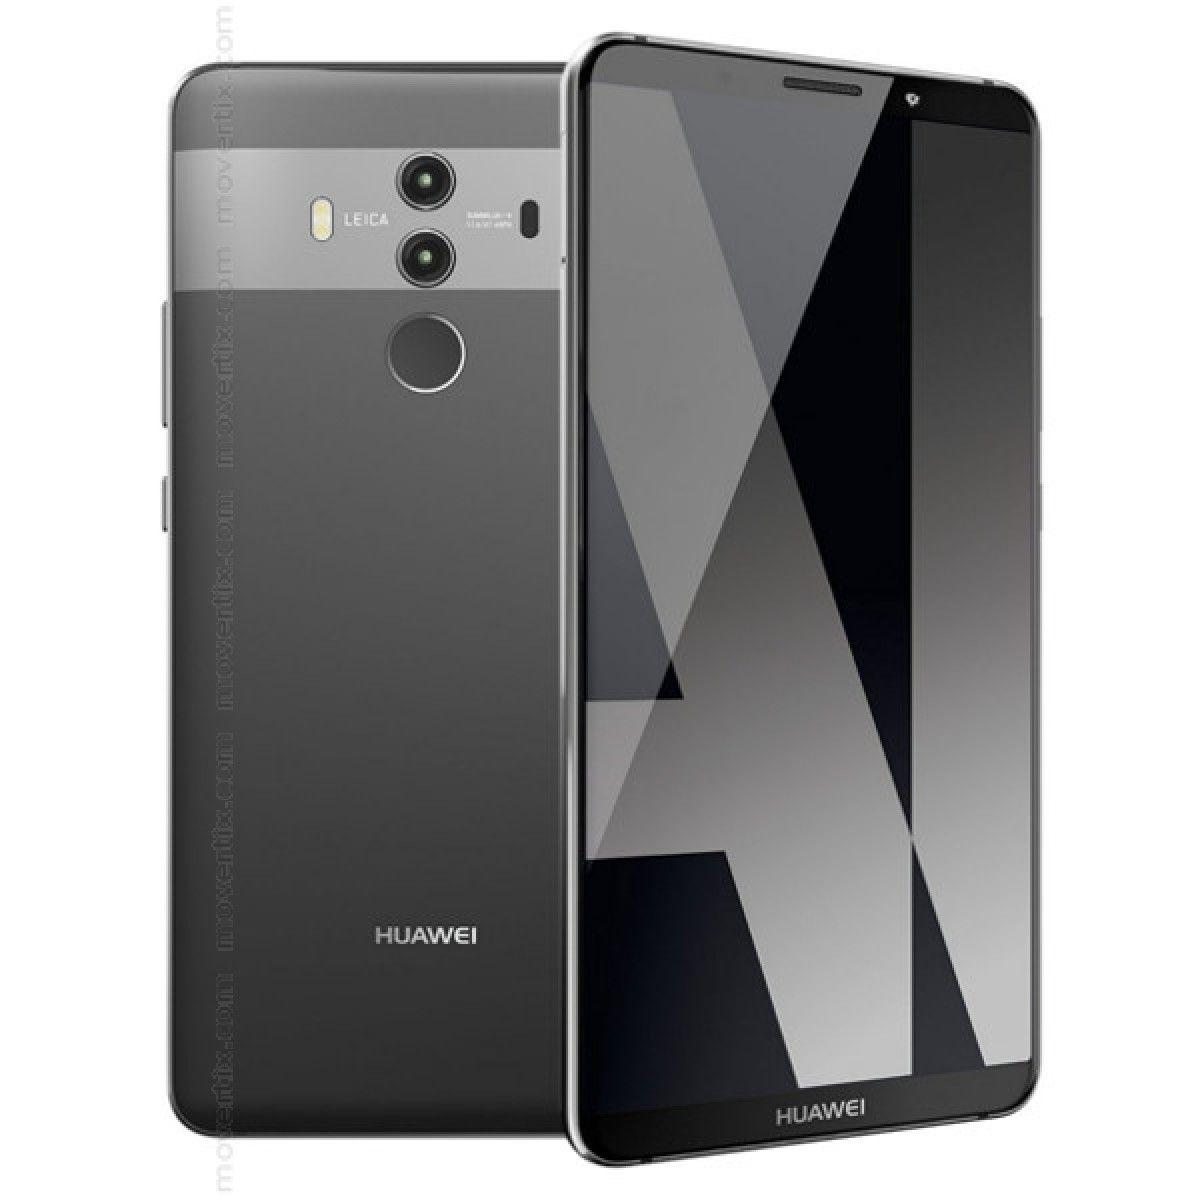 Grade B Huawei Mate 10 Pro - 128GB - Titanium Grey (Vodafone) Smartphone - £172 (With Code) @ eBay / Music Magpie